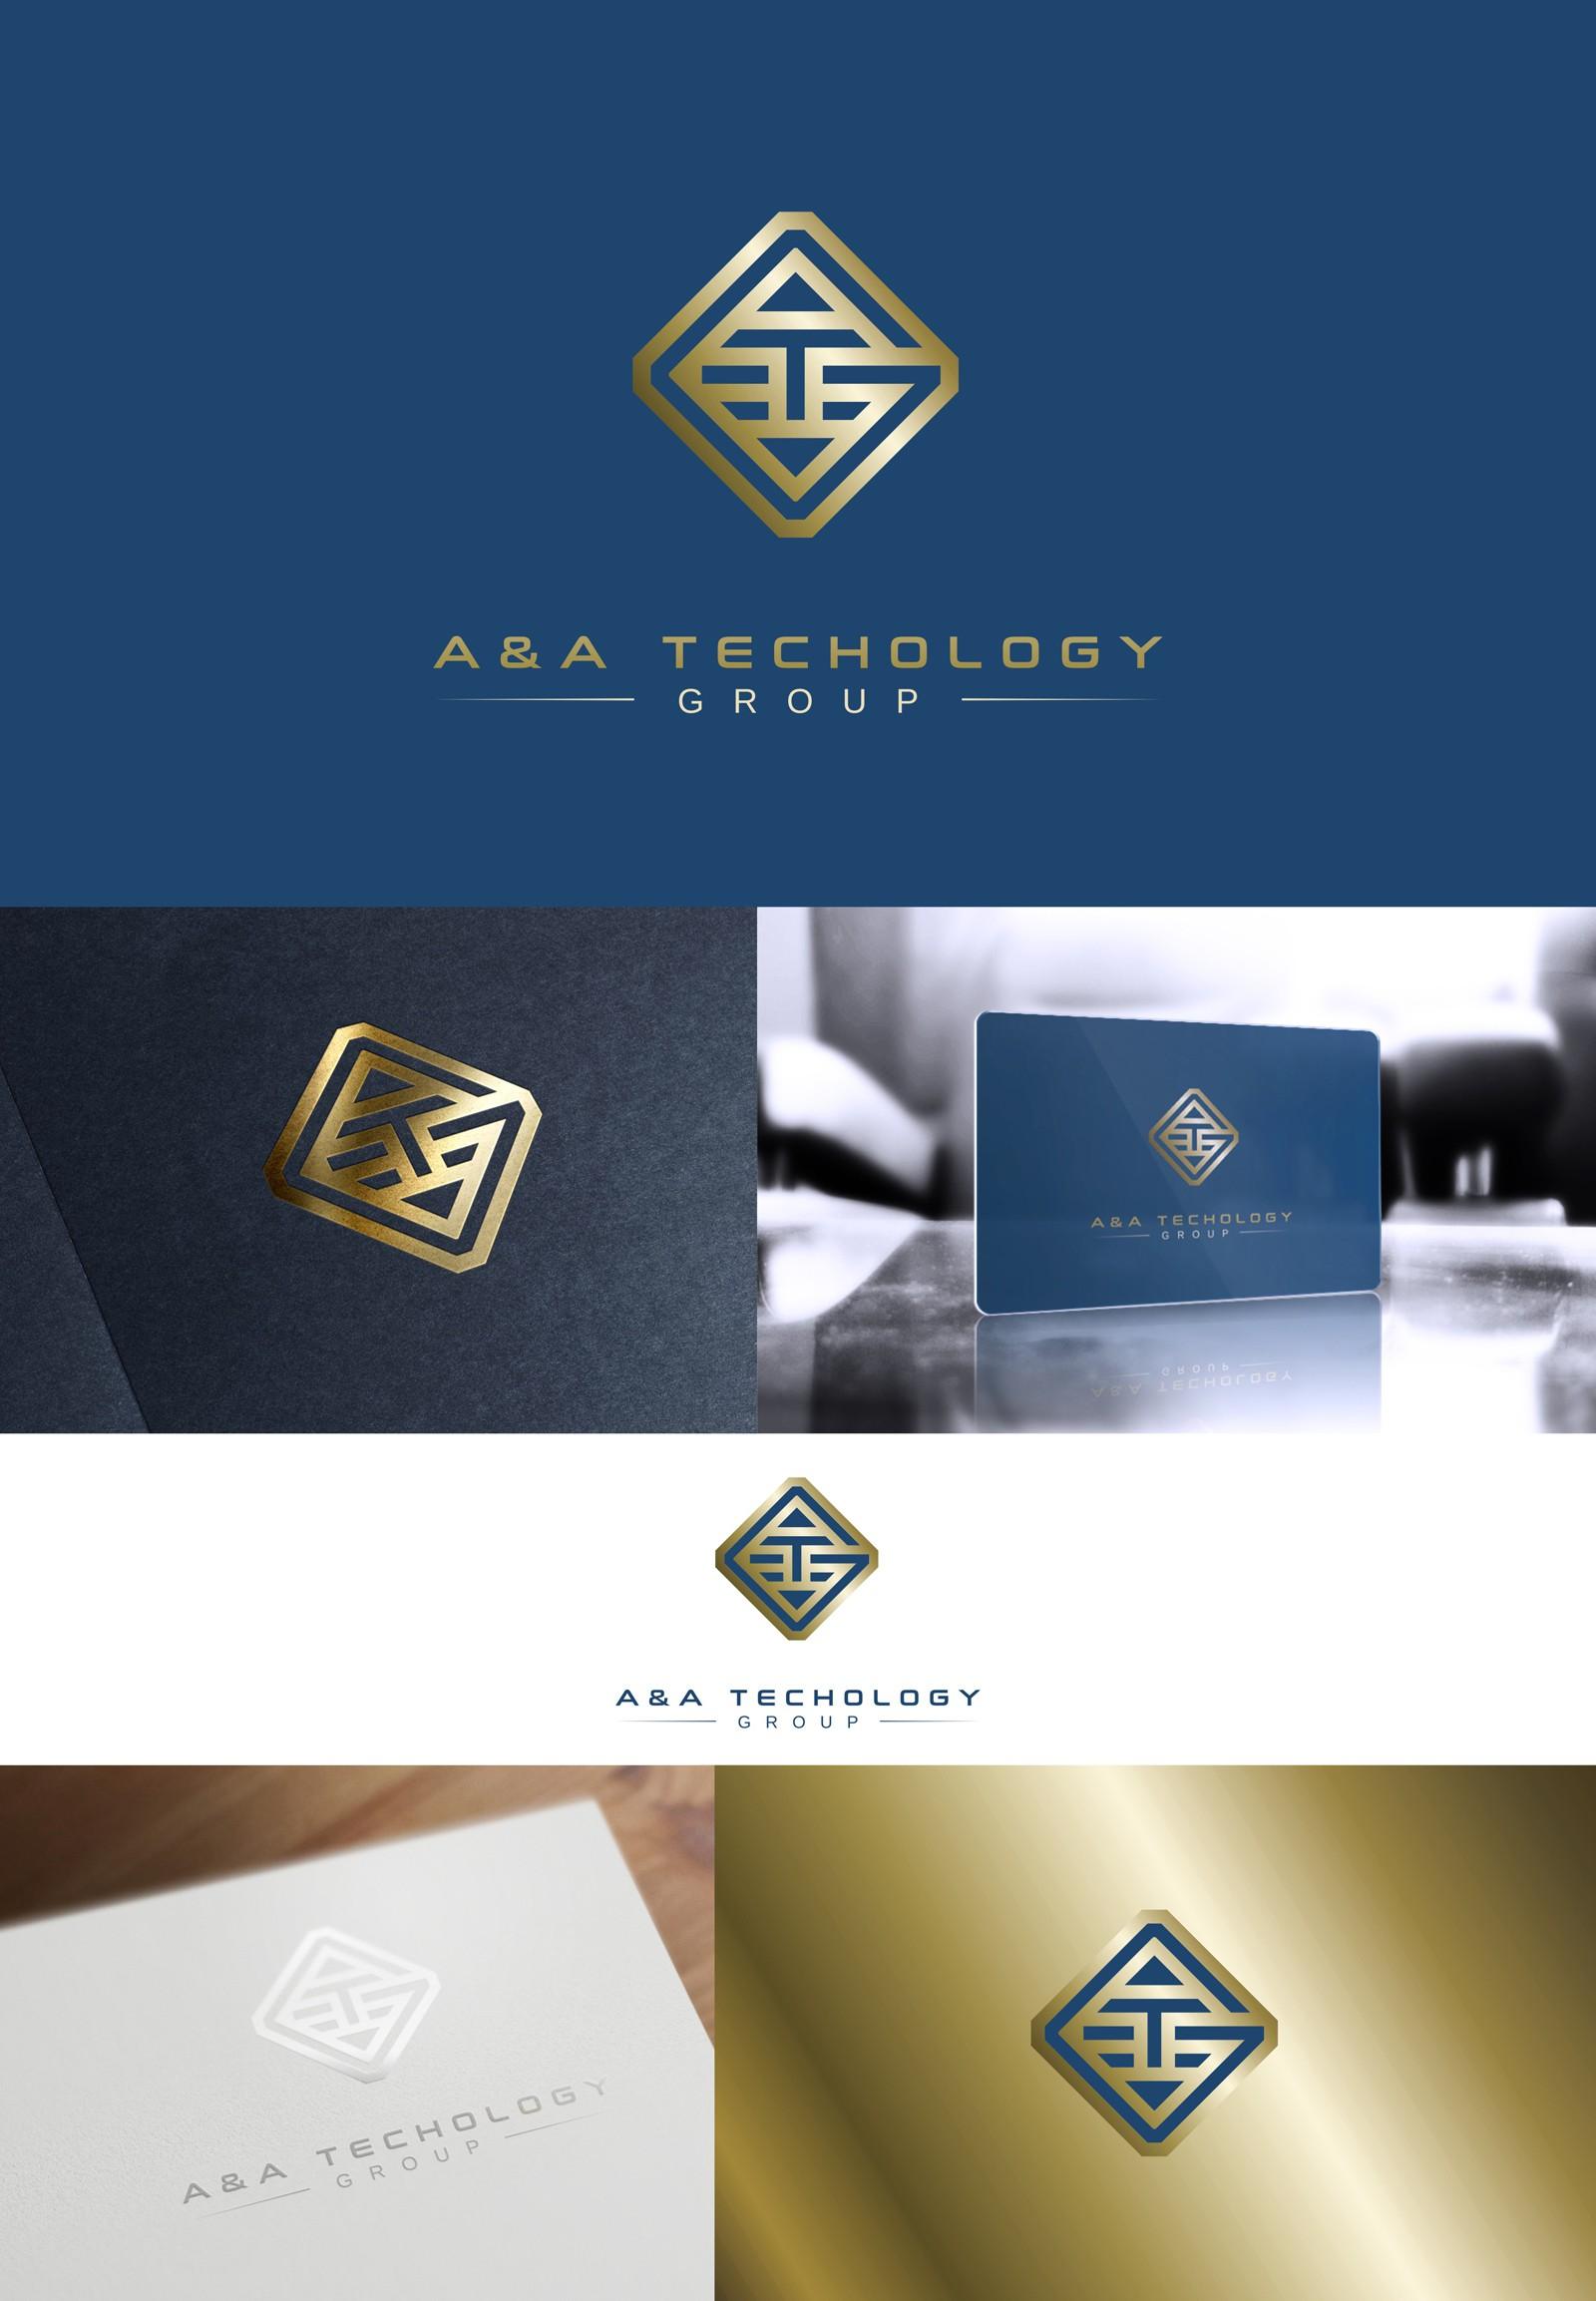 A&A Technology Group